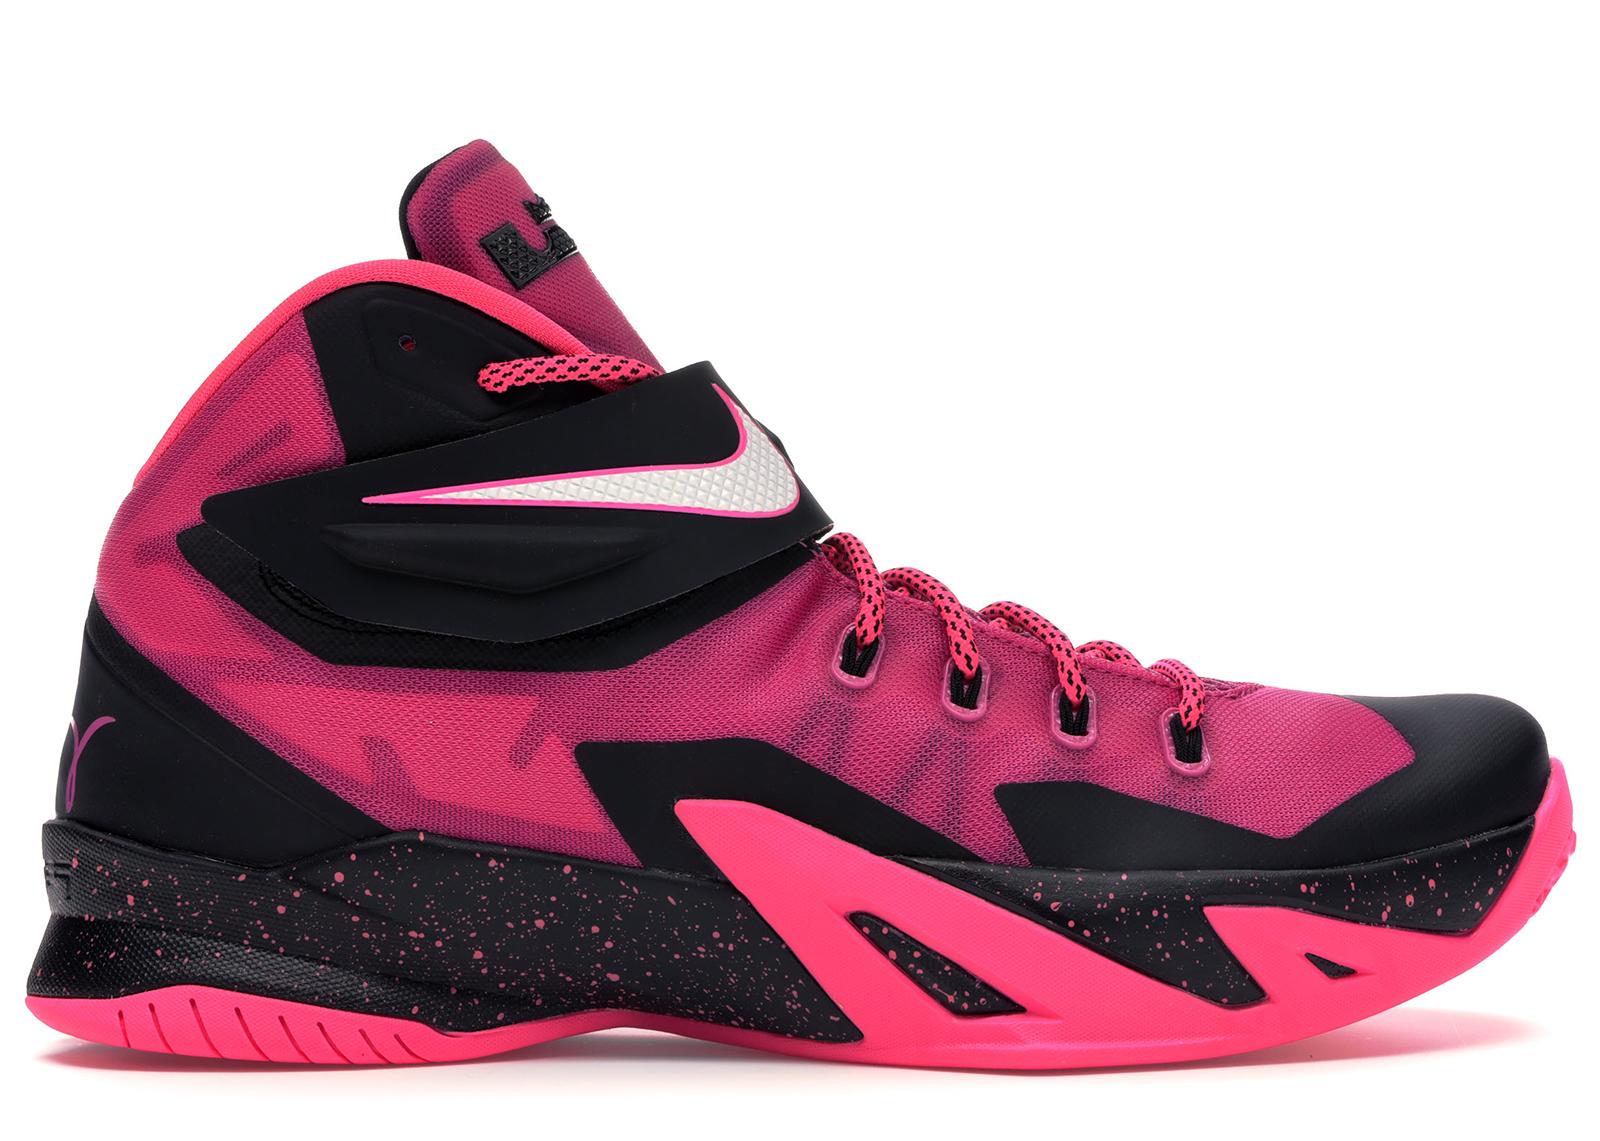 Nike Zoom LeBron Soldier 8 Think Pink